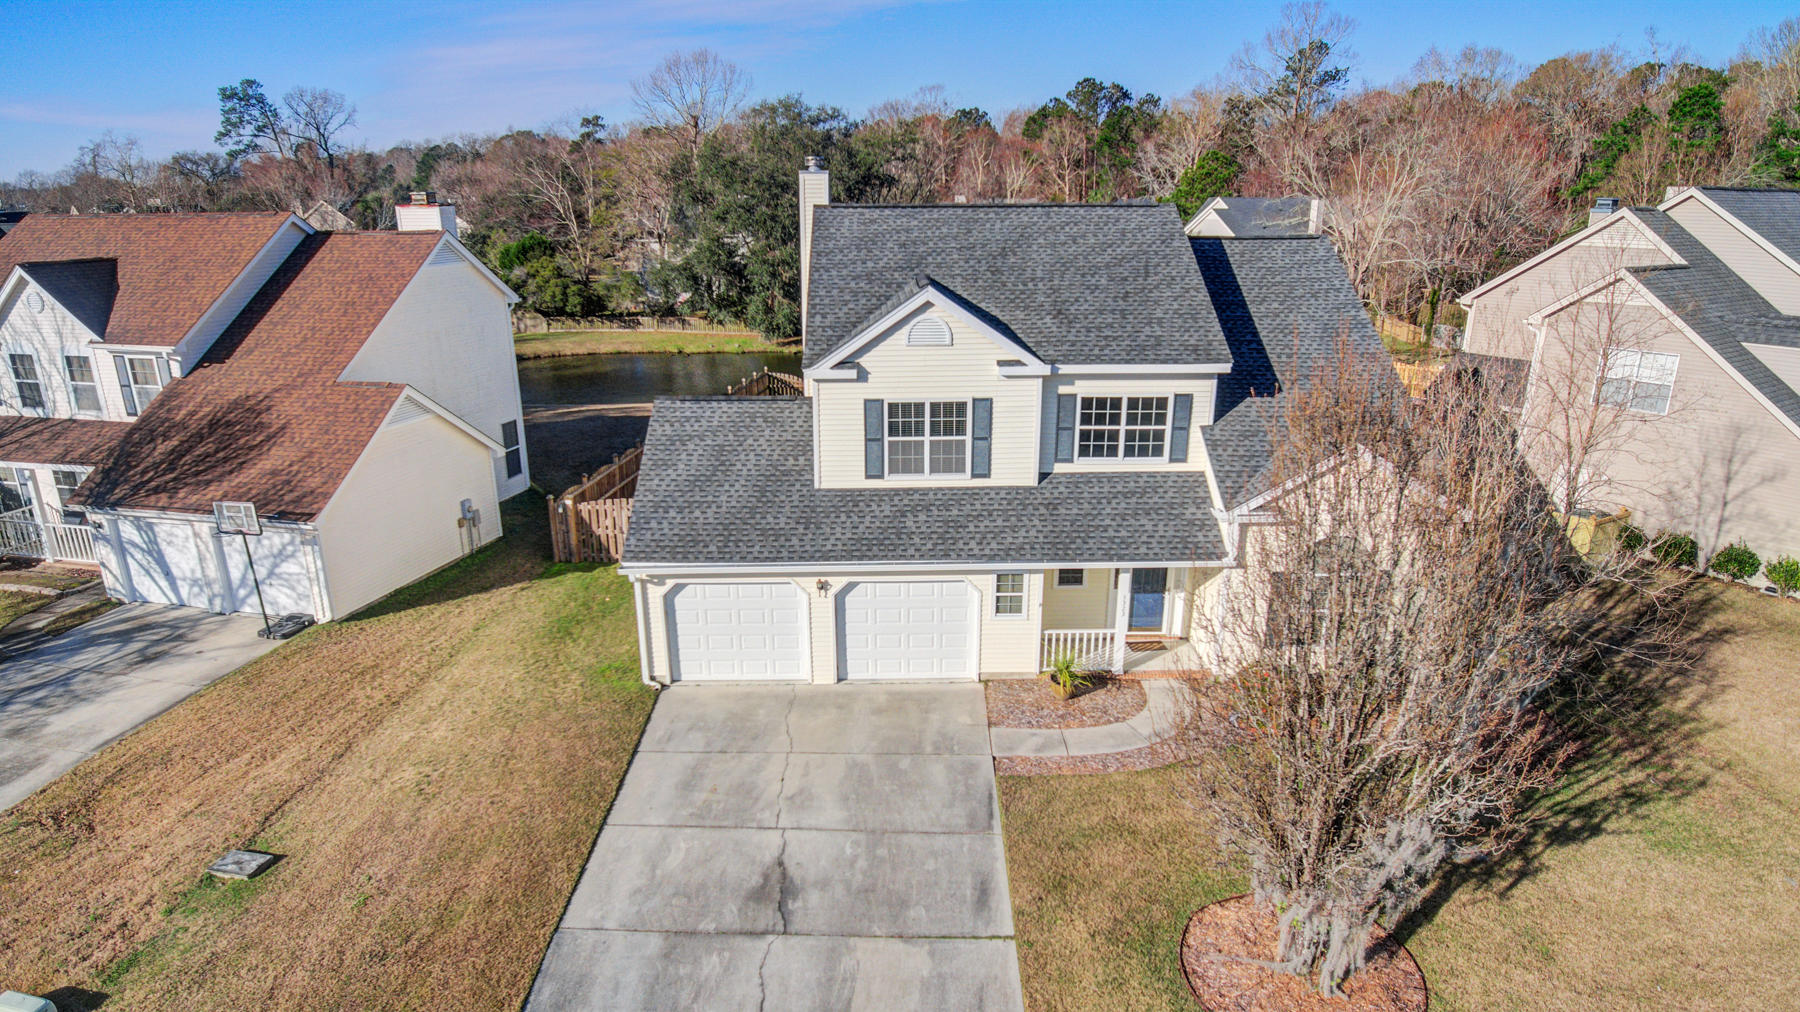 Village Green Homes For Sale - 3323 Hearthside, Charleston, SC - 3